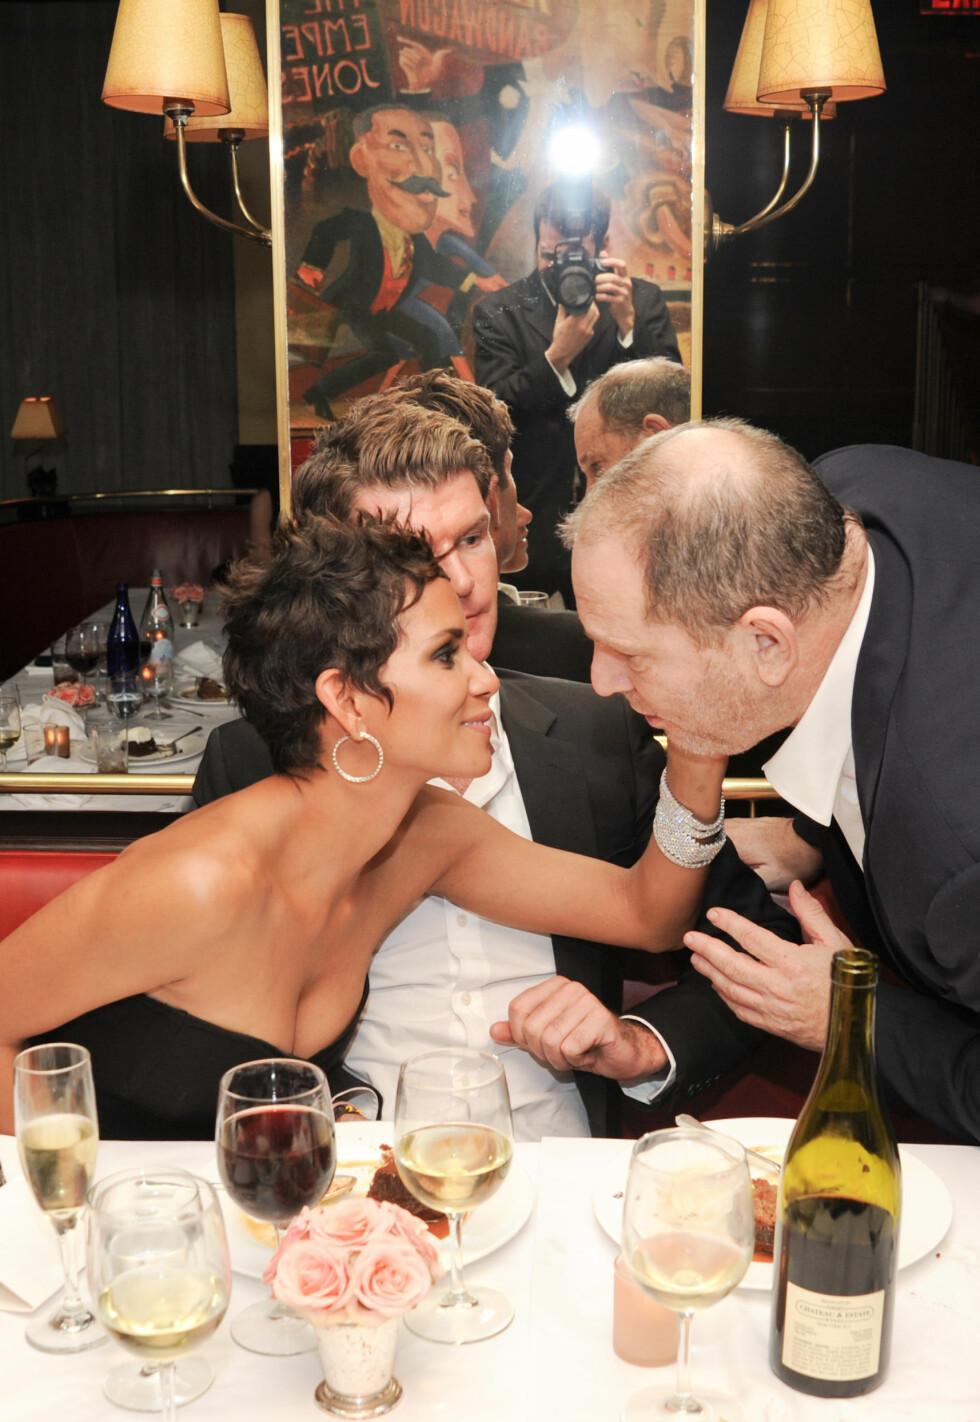 HALLE BERRY: Skuespiller Halle Berry og Harvey Weinstein i 2010. Foto: NTB Scanpix